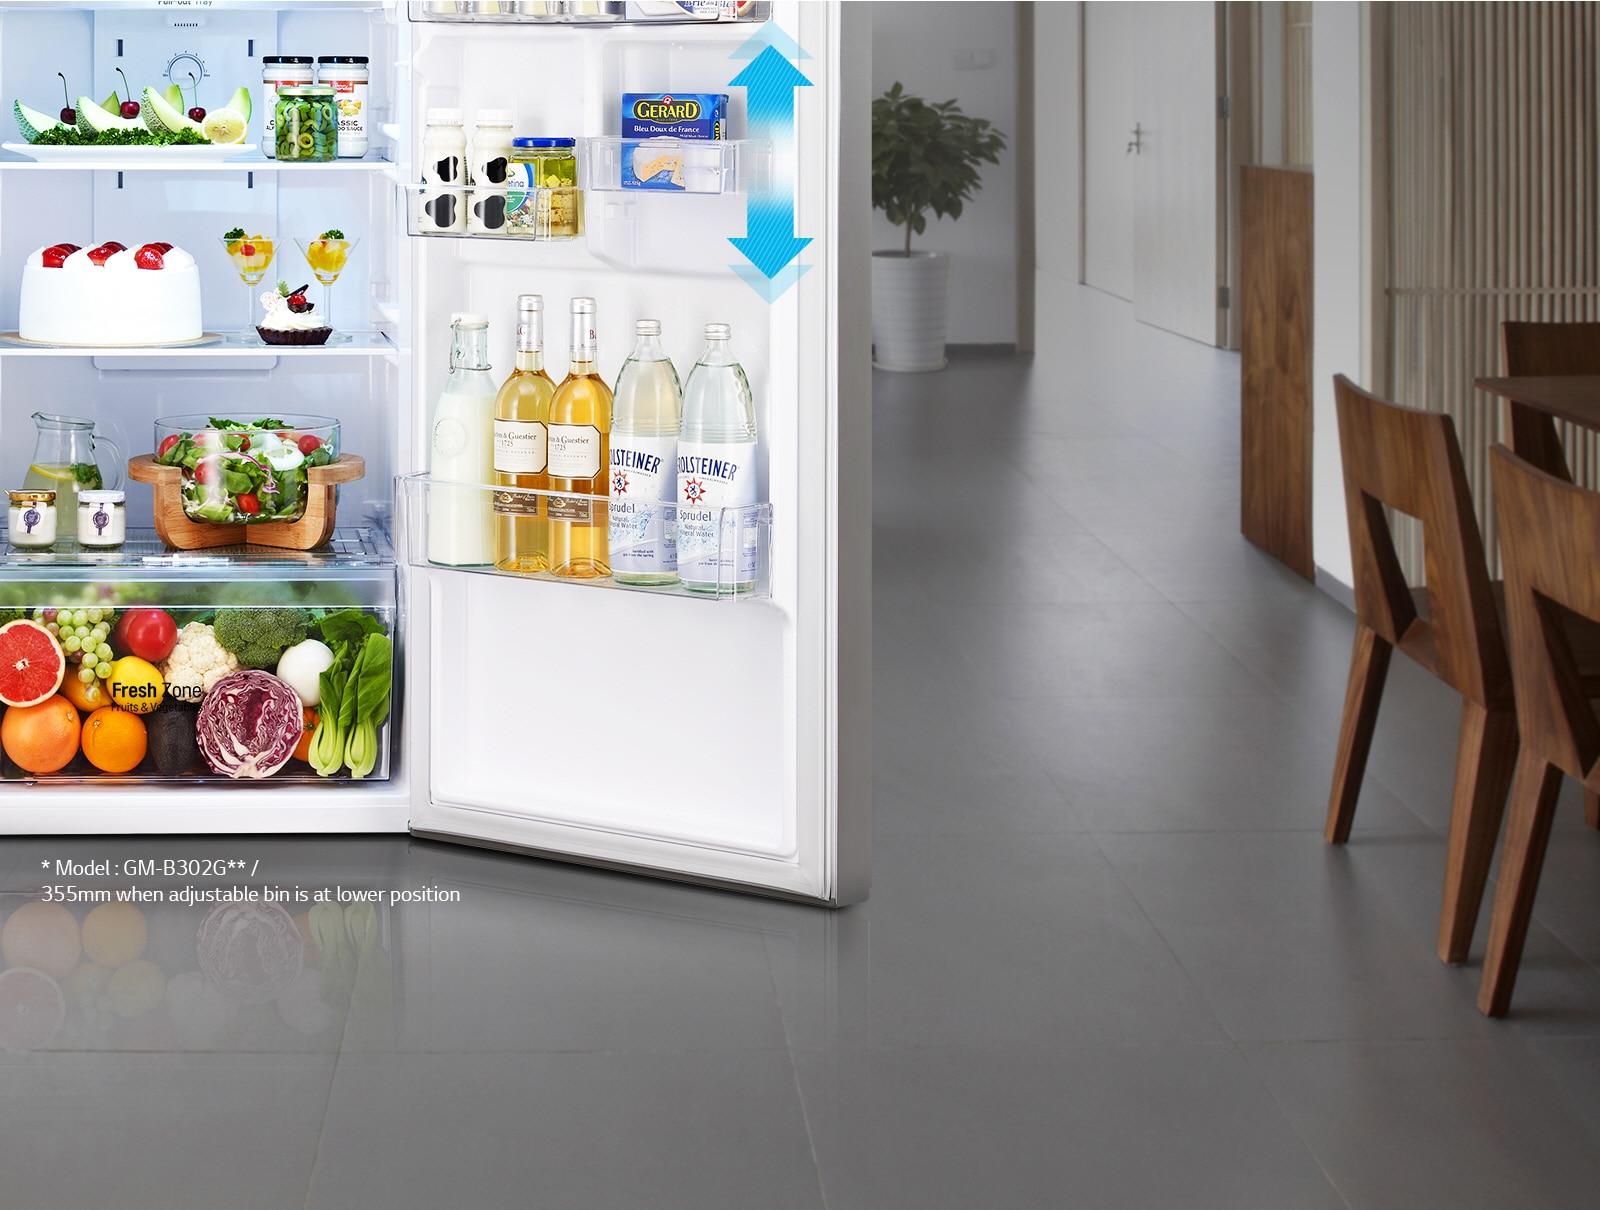 Lg 360 Litres Frost Free Refrigerator With New Smart Inverter Lock Ampamp Ordinary Crisper Hpl932d700ml Tall Bottle Door Bin